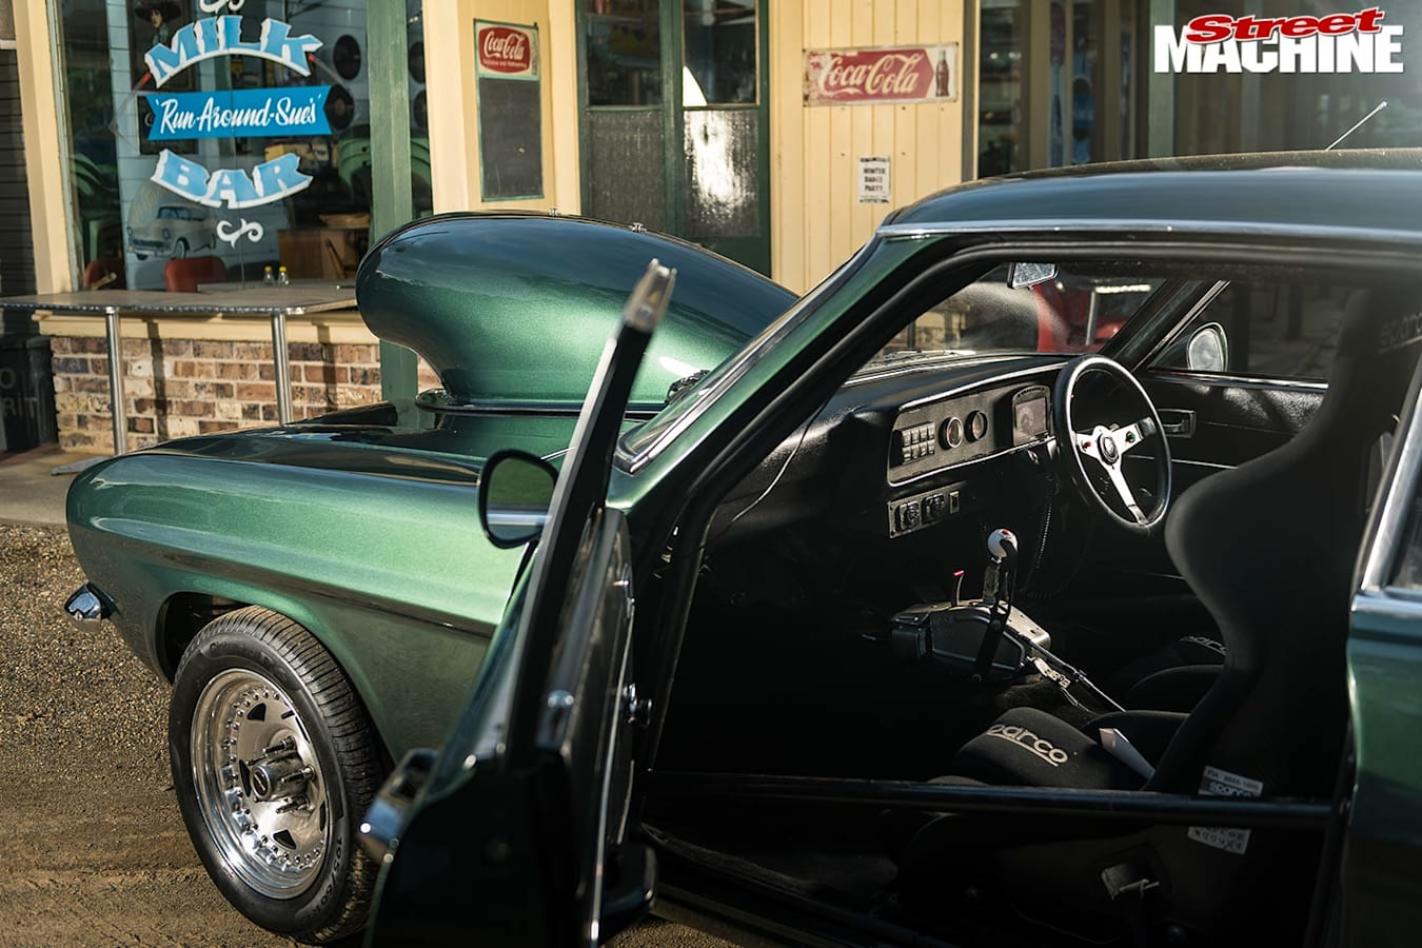 Alon Vella's Ford Capri